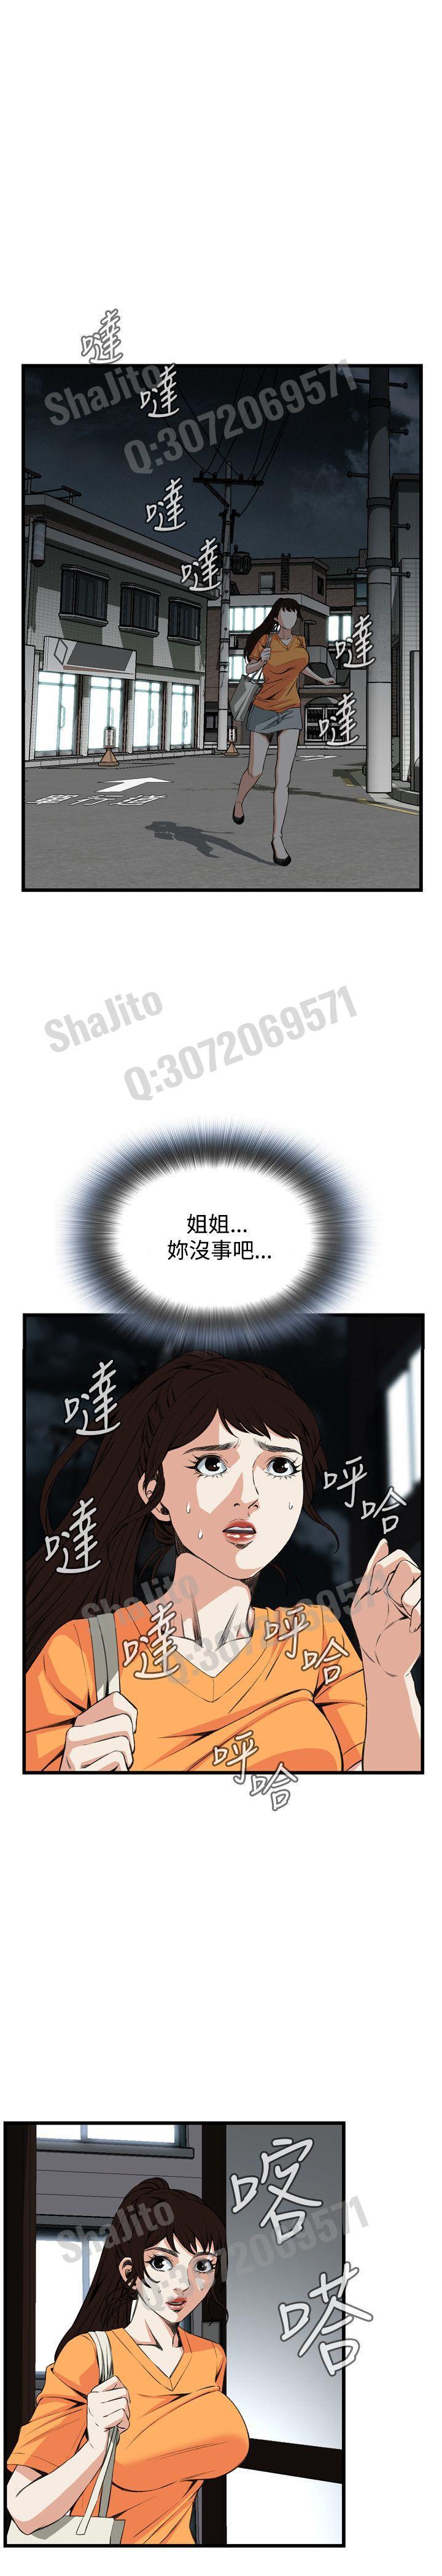 Take a peek 偷窥67-69 Chinese 43